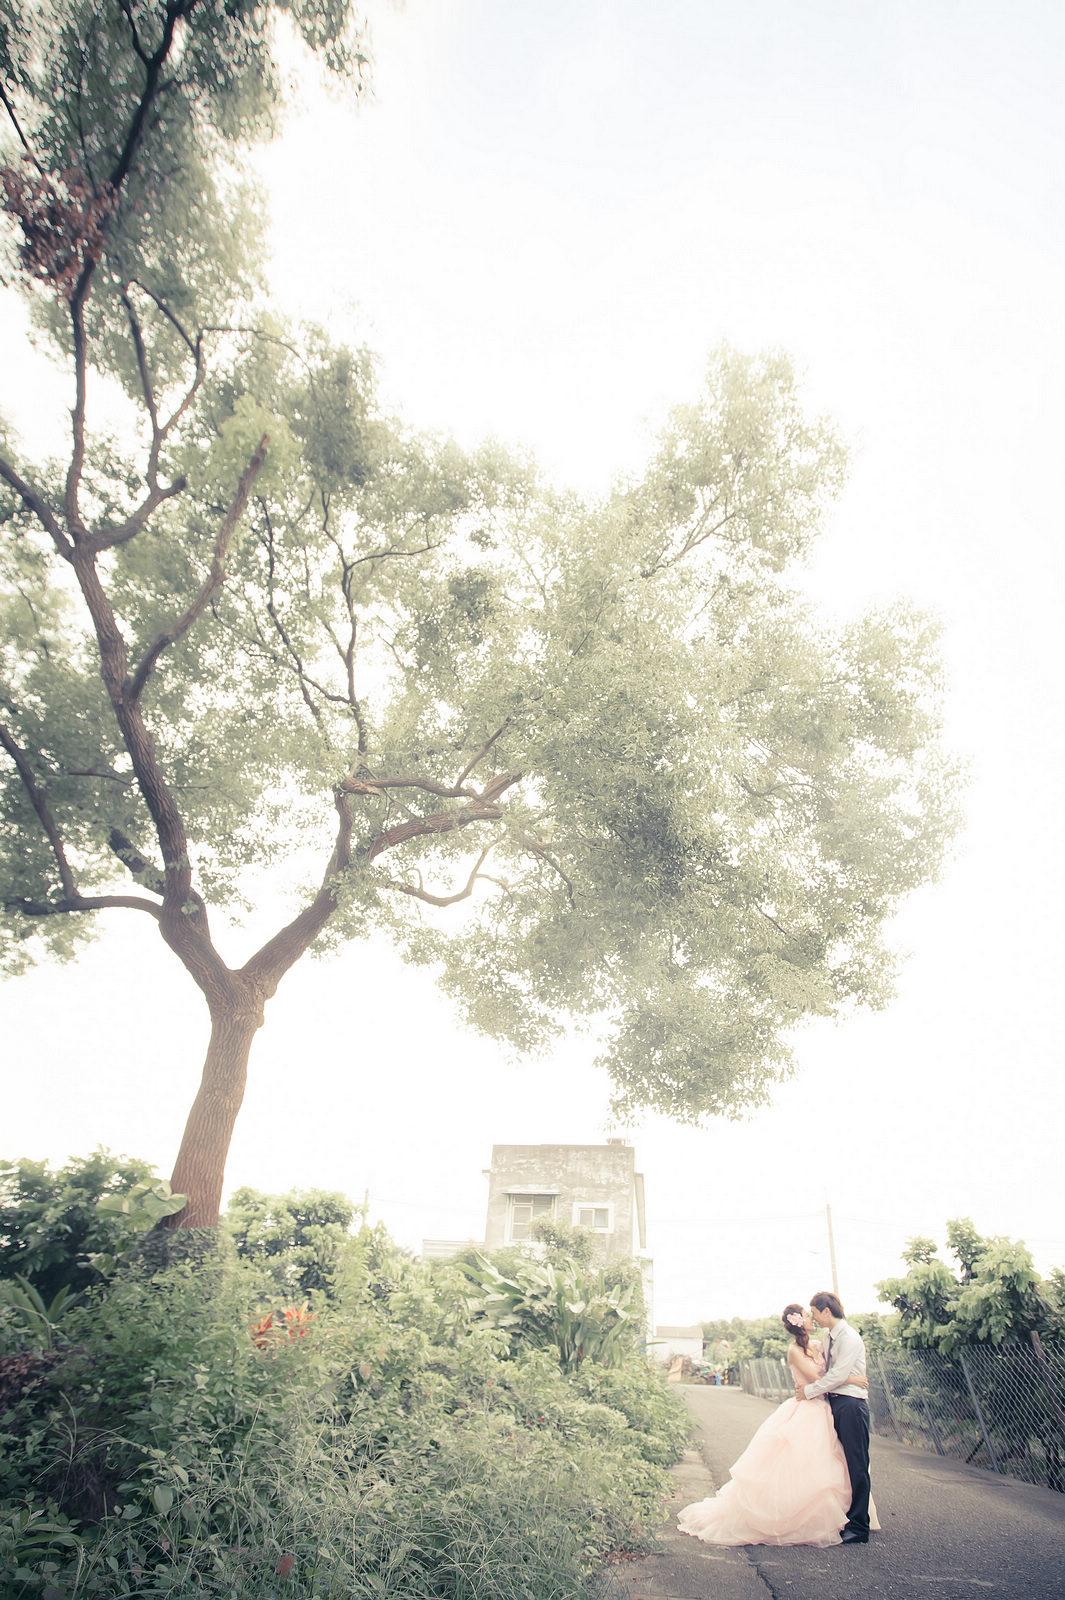 nEO_IMG_20130929 冠廷 惠貞1631